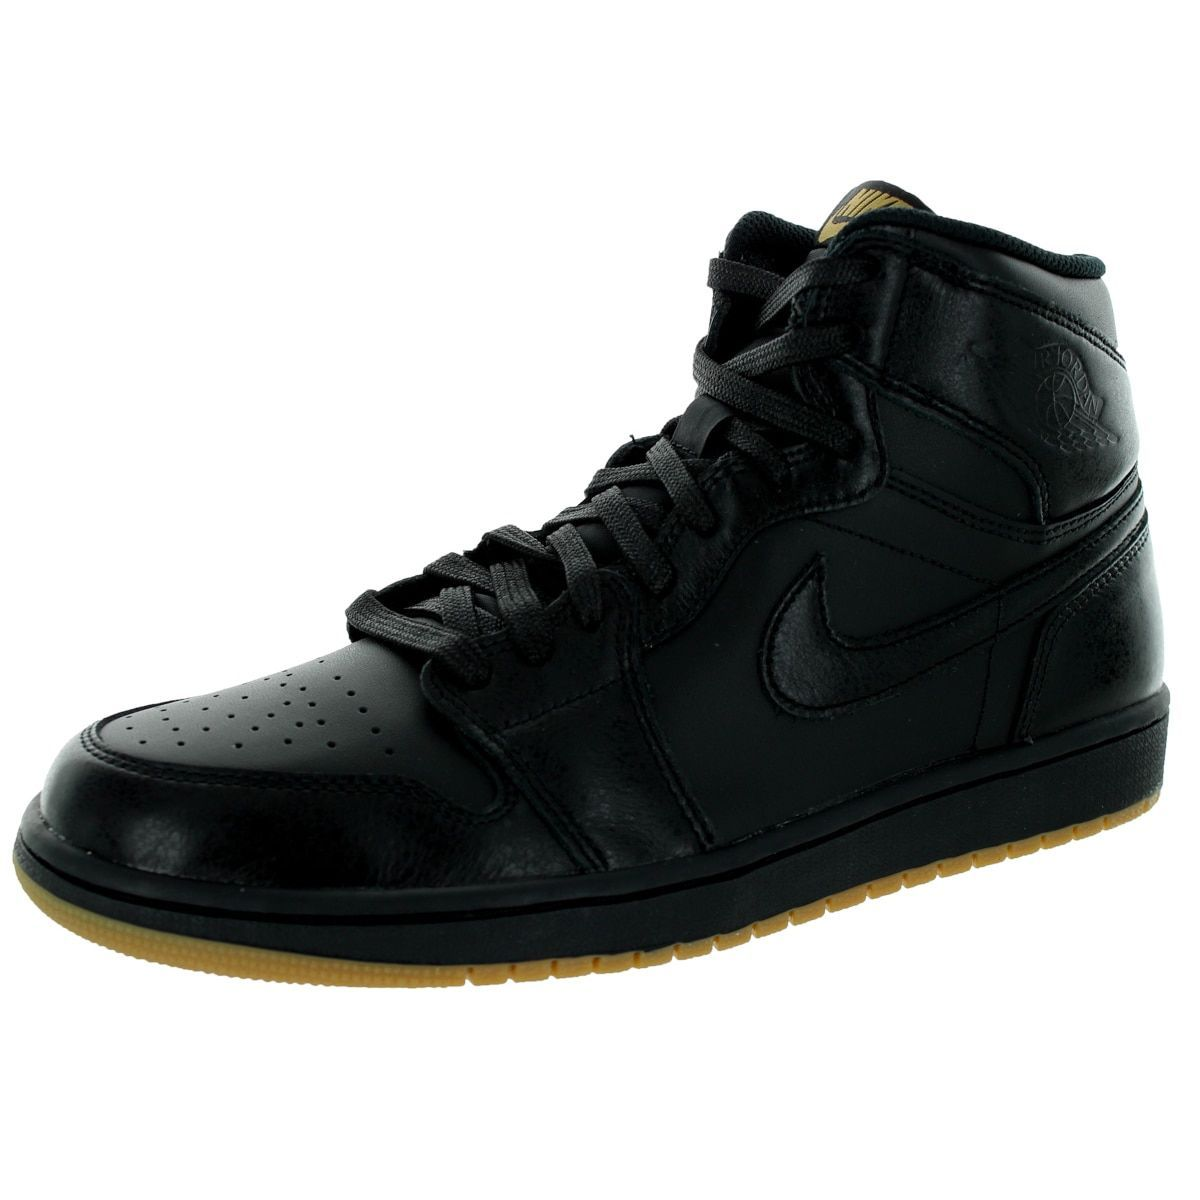 65b20ce53dc32 Nike Men's Air Jordan 1 Retro High OG Basketball Shoe Basketball ...